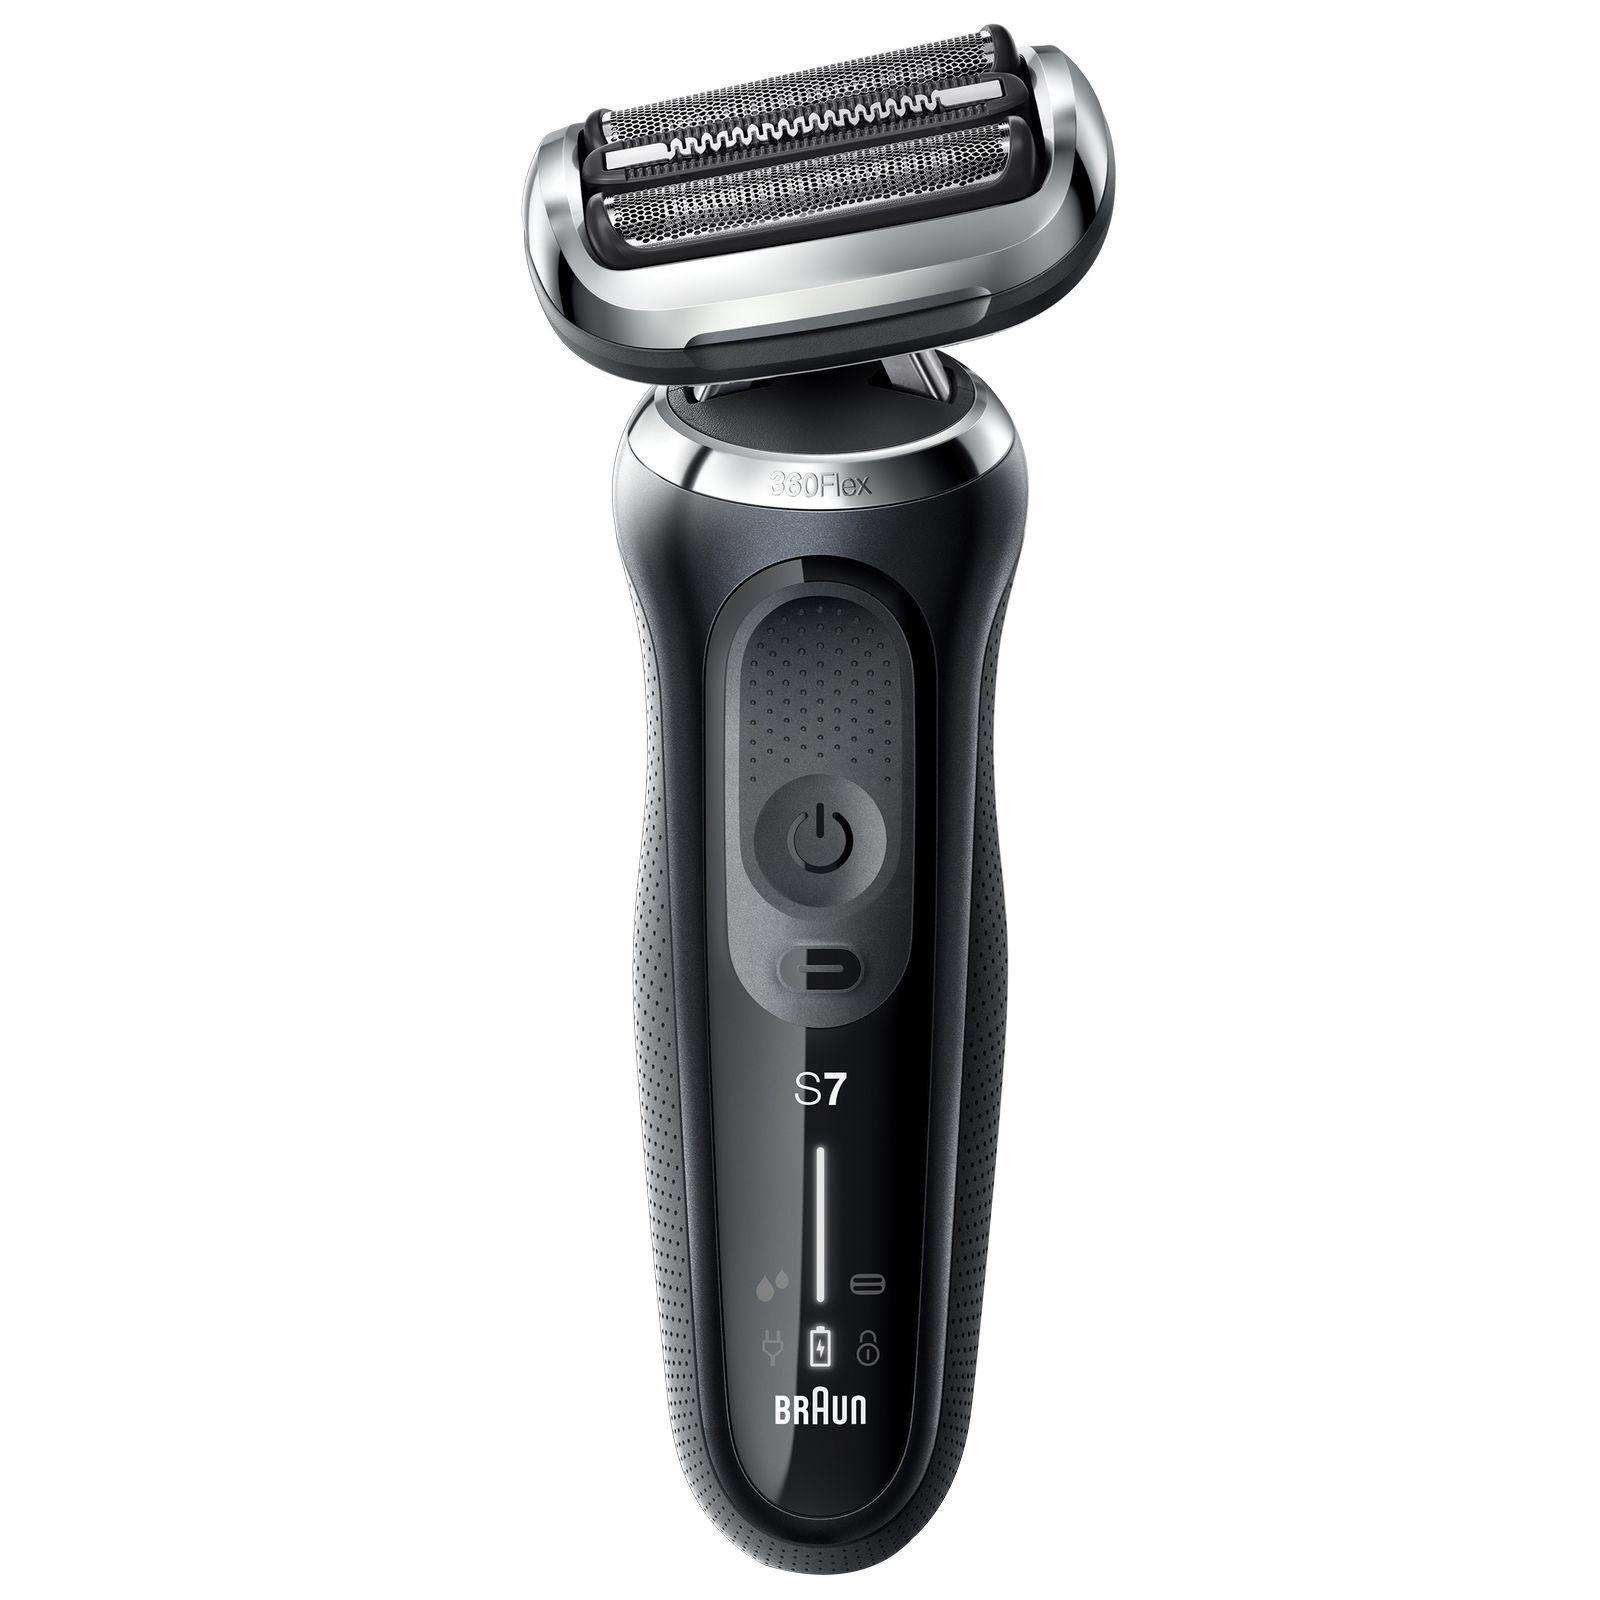 Braun - Series Shavers Series 7 70-N1200s Smart Shaver for Men